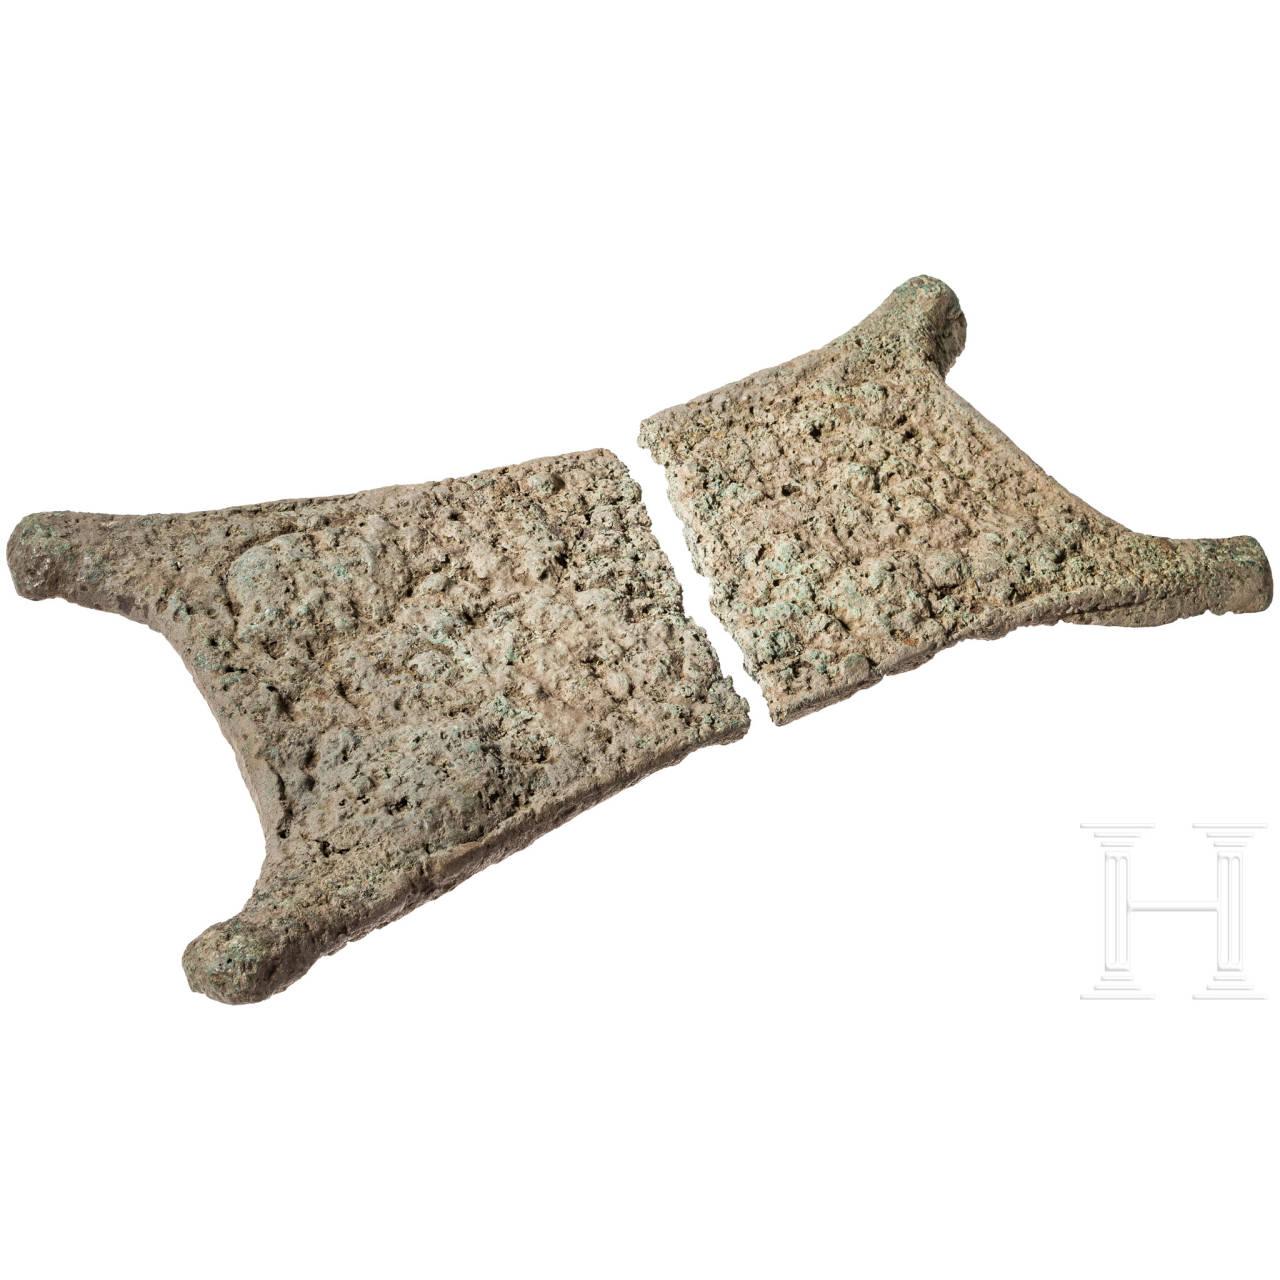 Ochsenhautbarren, Kupfer, ostmediterrane Spätbronzezeit, 16./15. - 11./10. Jhdt. v. Chr.